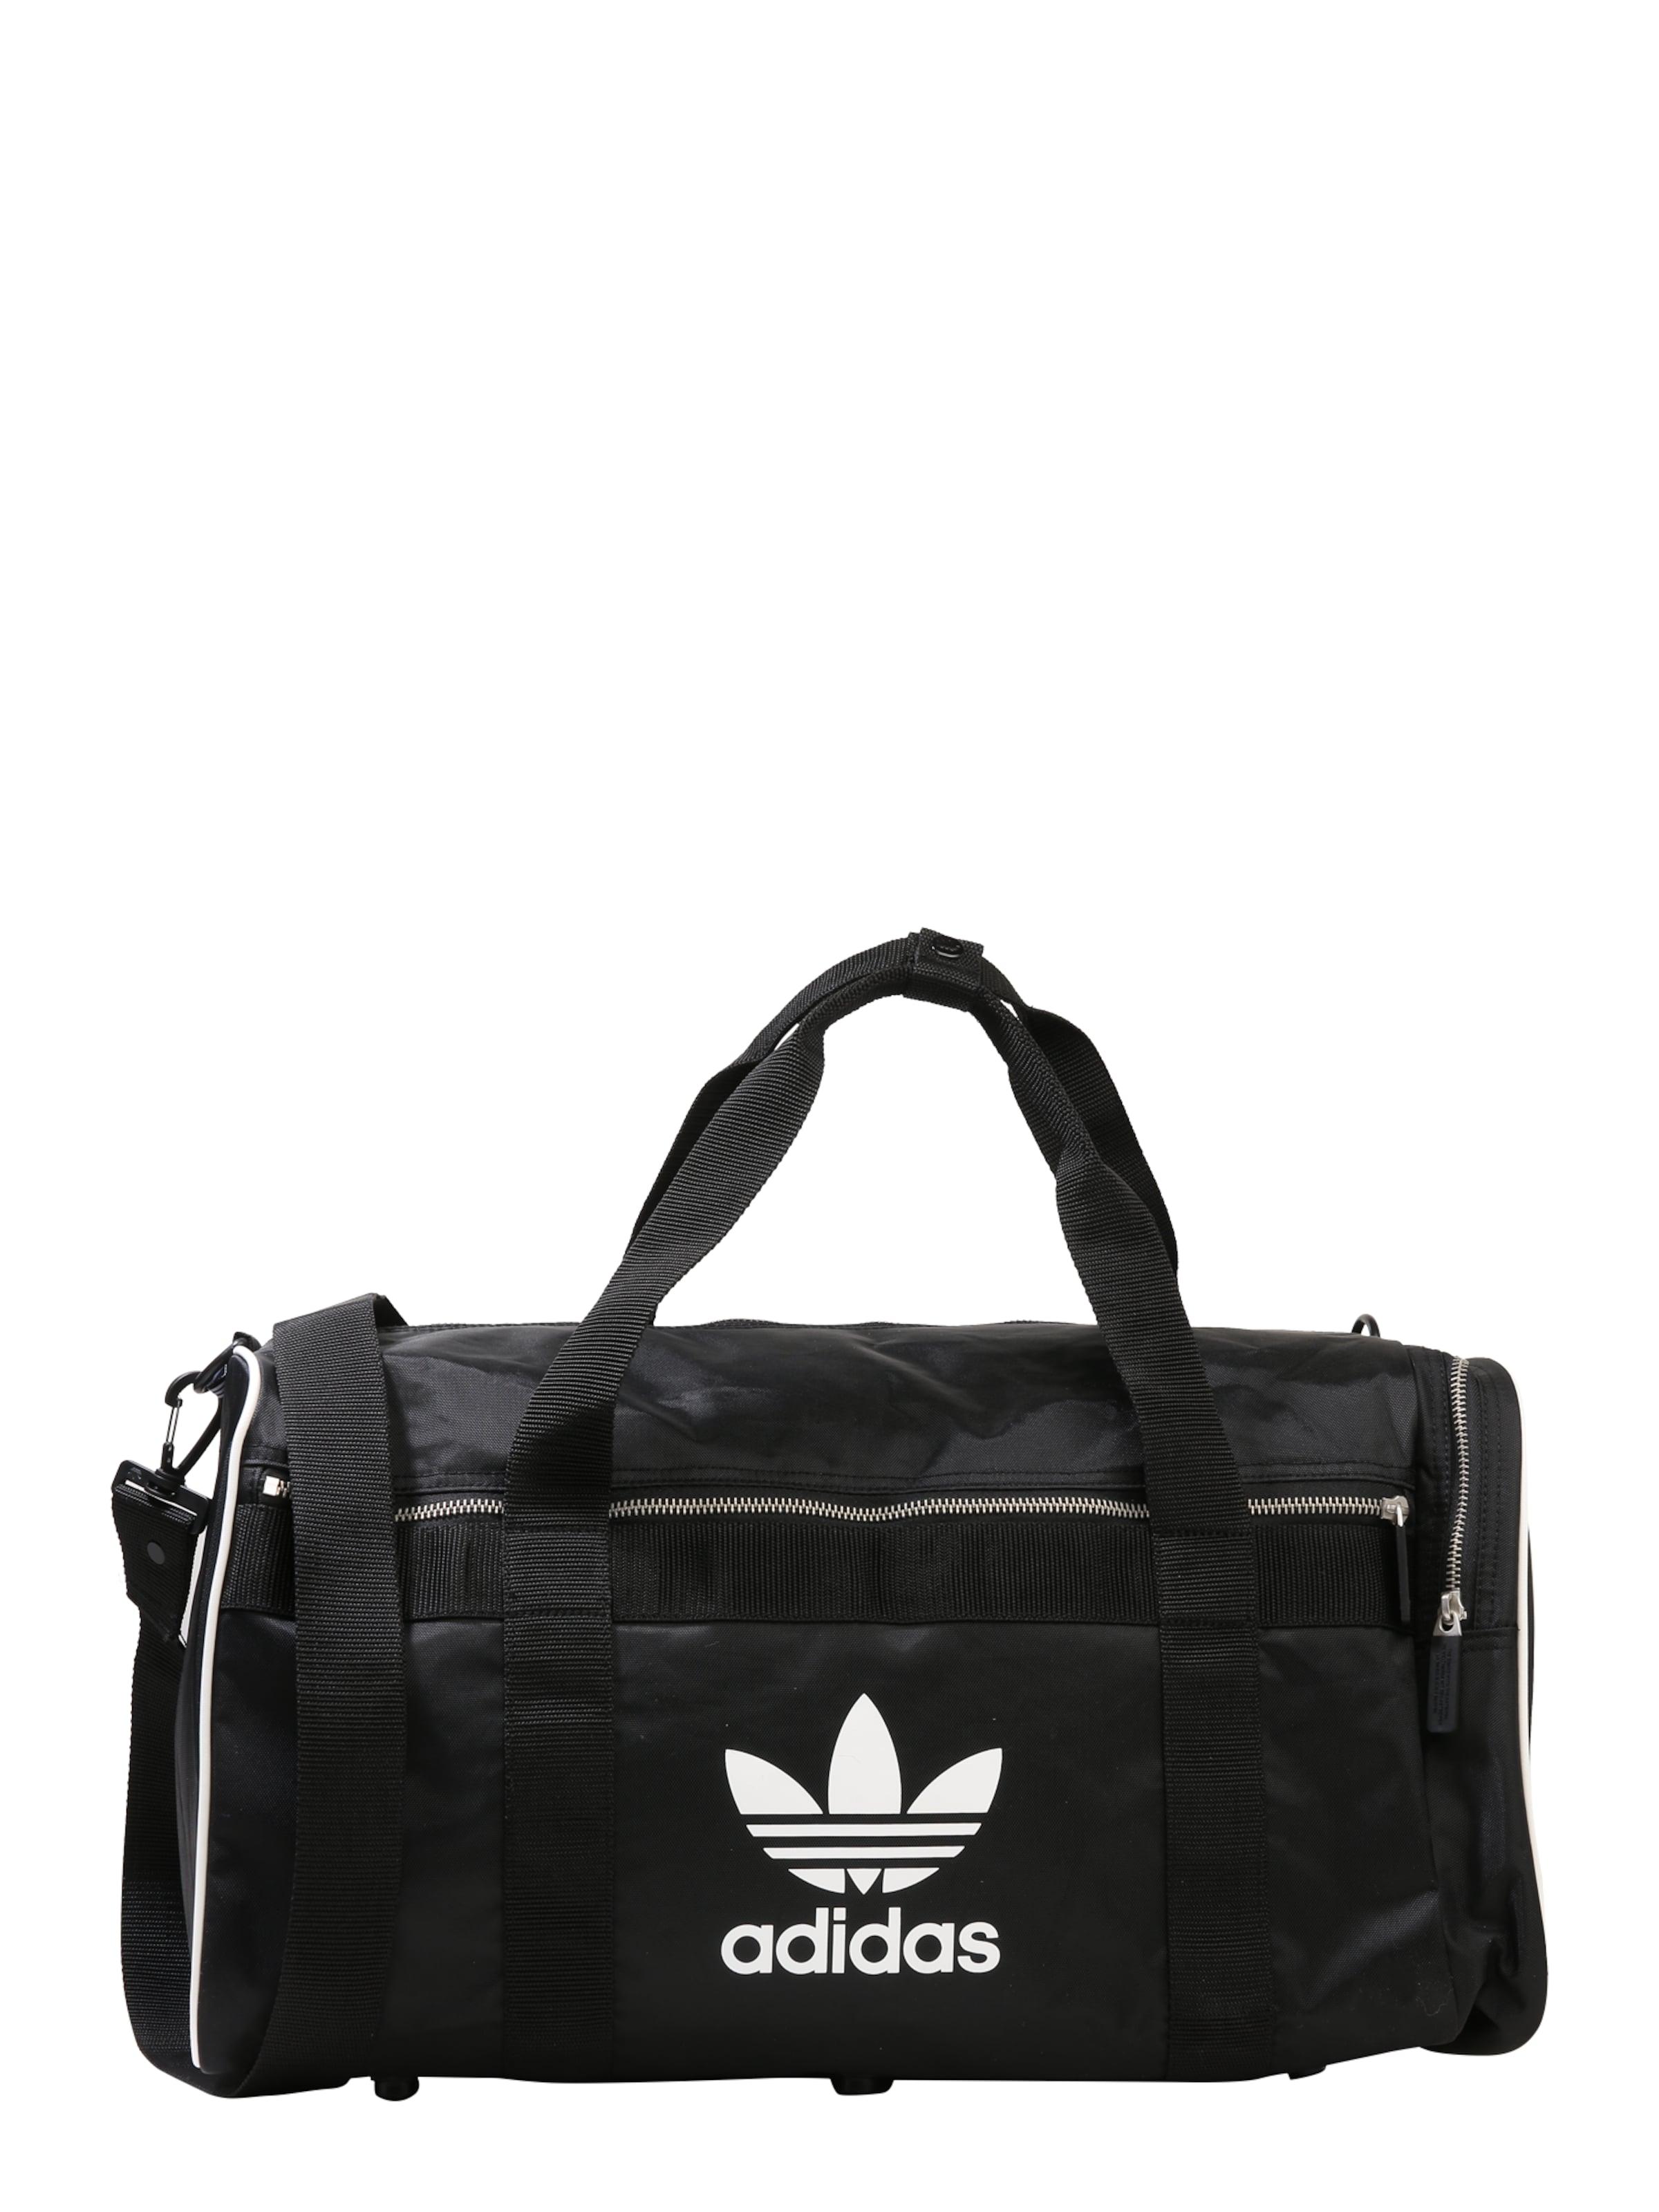 Weekendtas In L Adidas Originals ZwartWit 'duffle Ac' bIm7fY6gyv